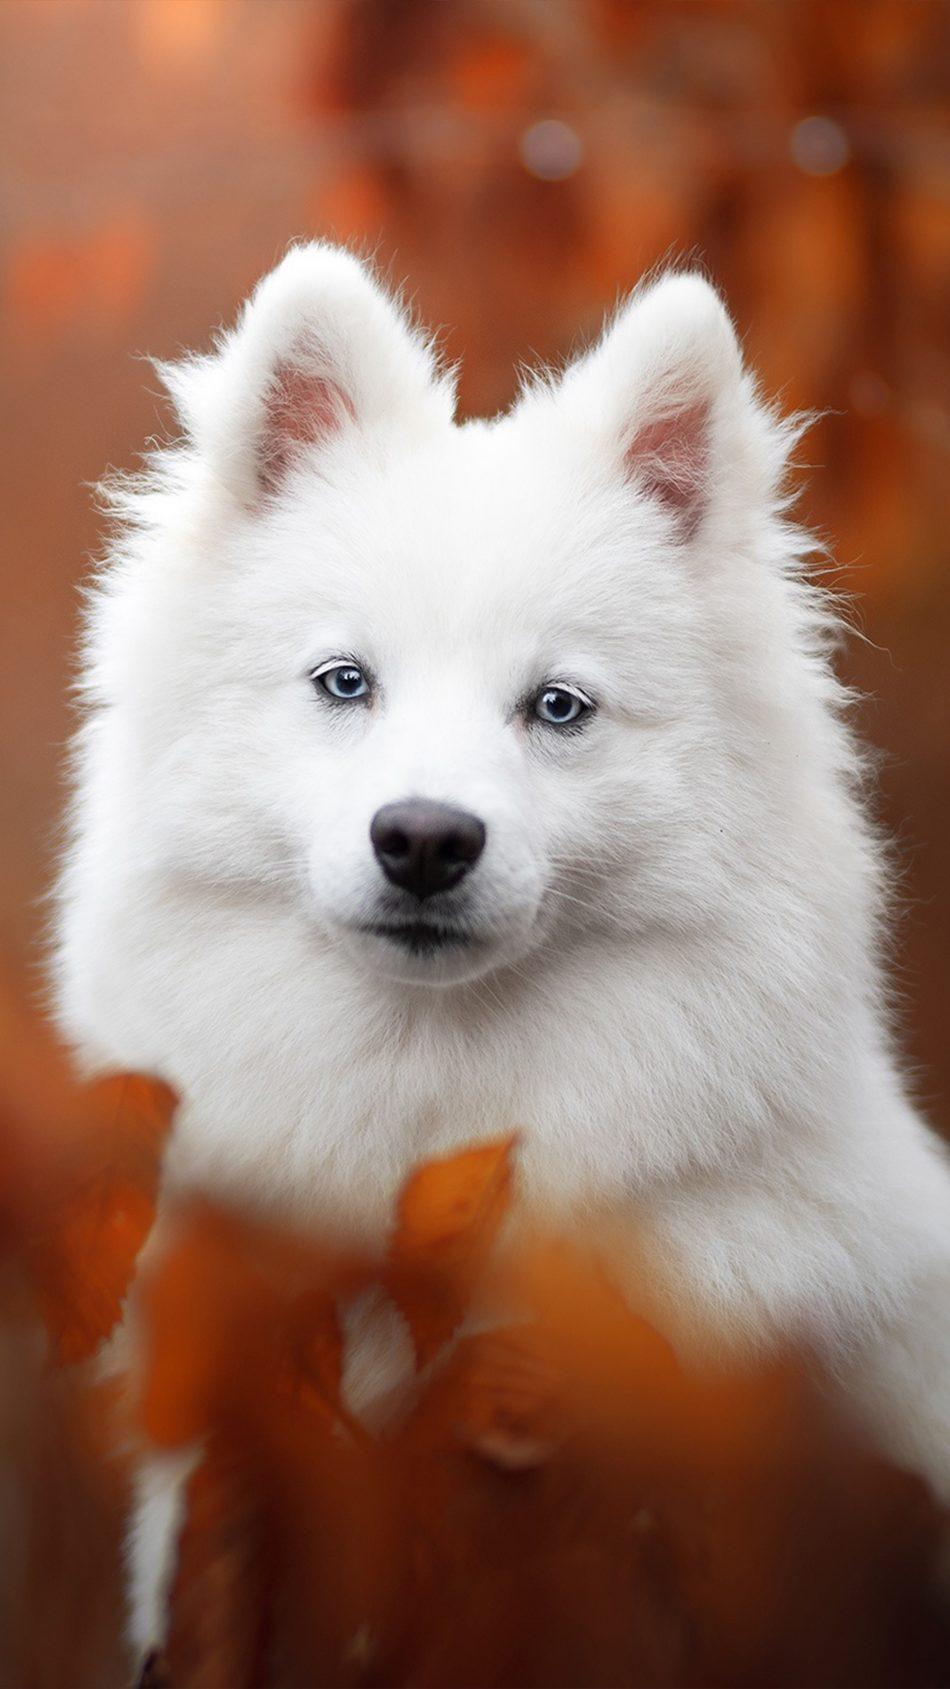 Spitz Pet Dog 4k Ultra Hd Mobile Wallpaper